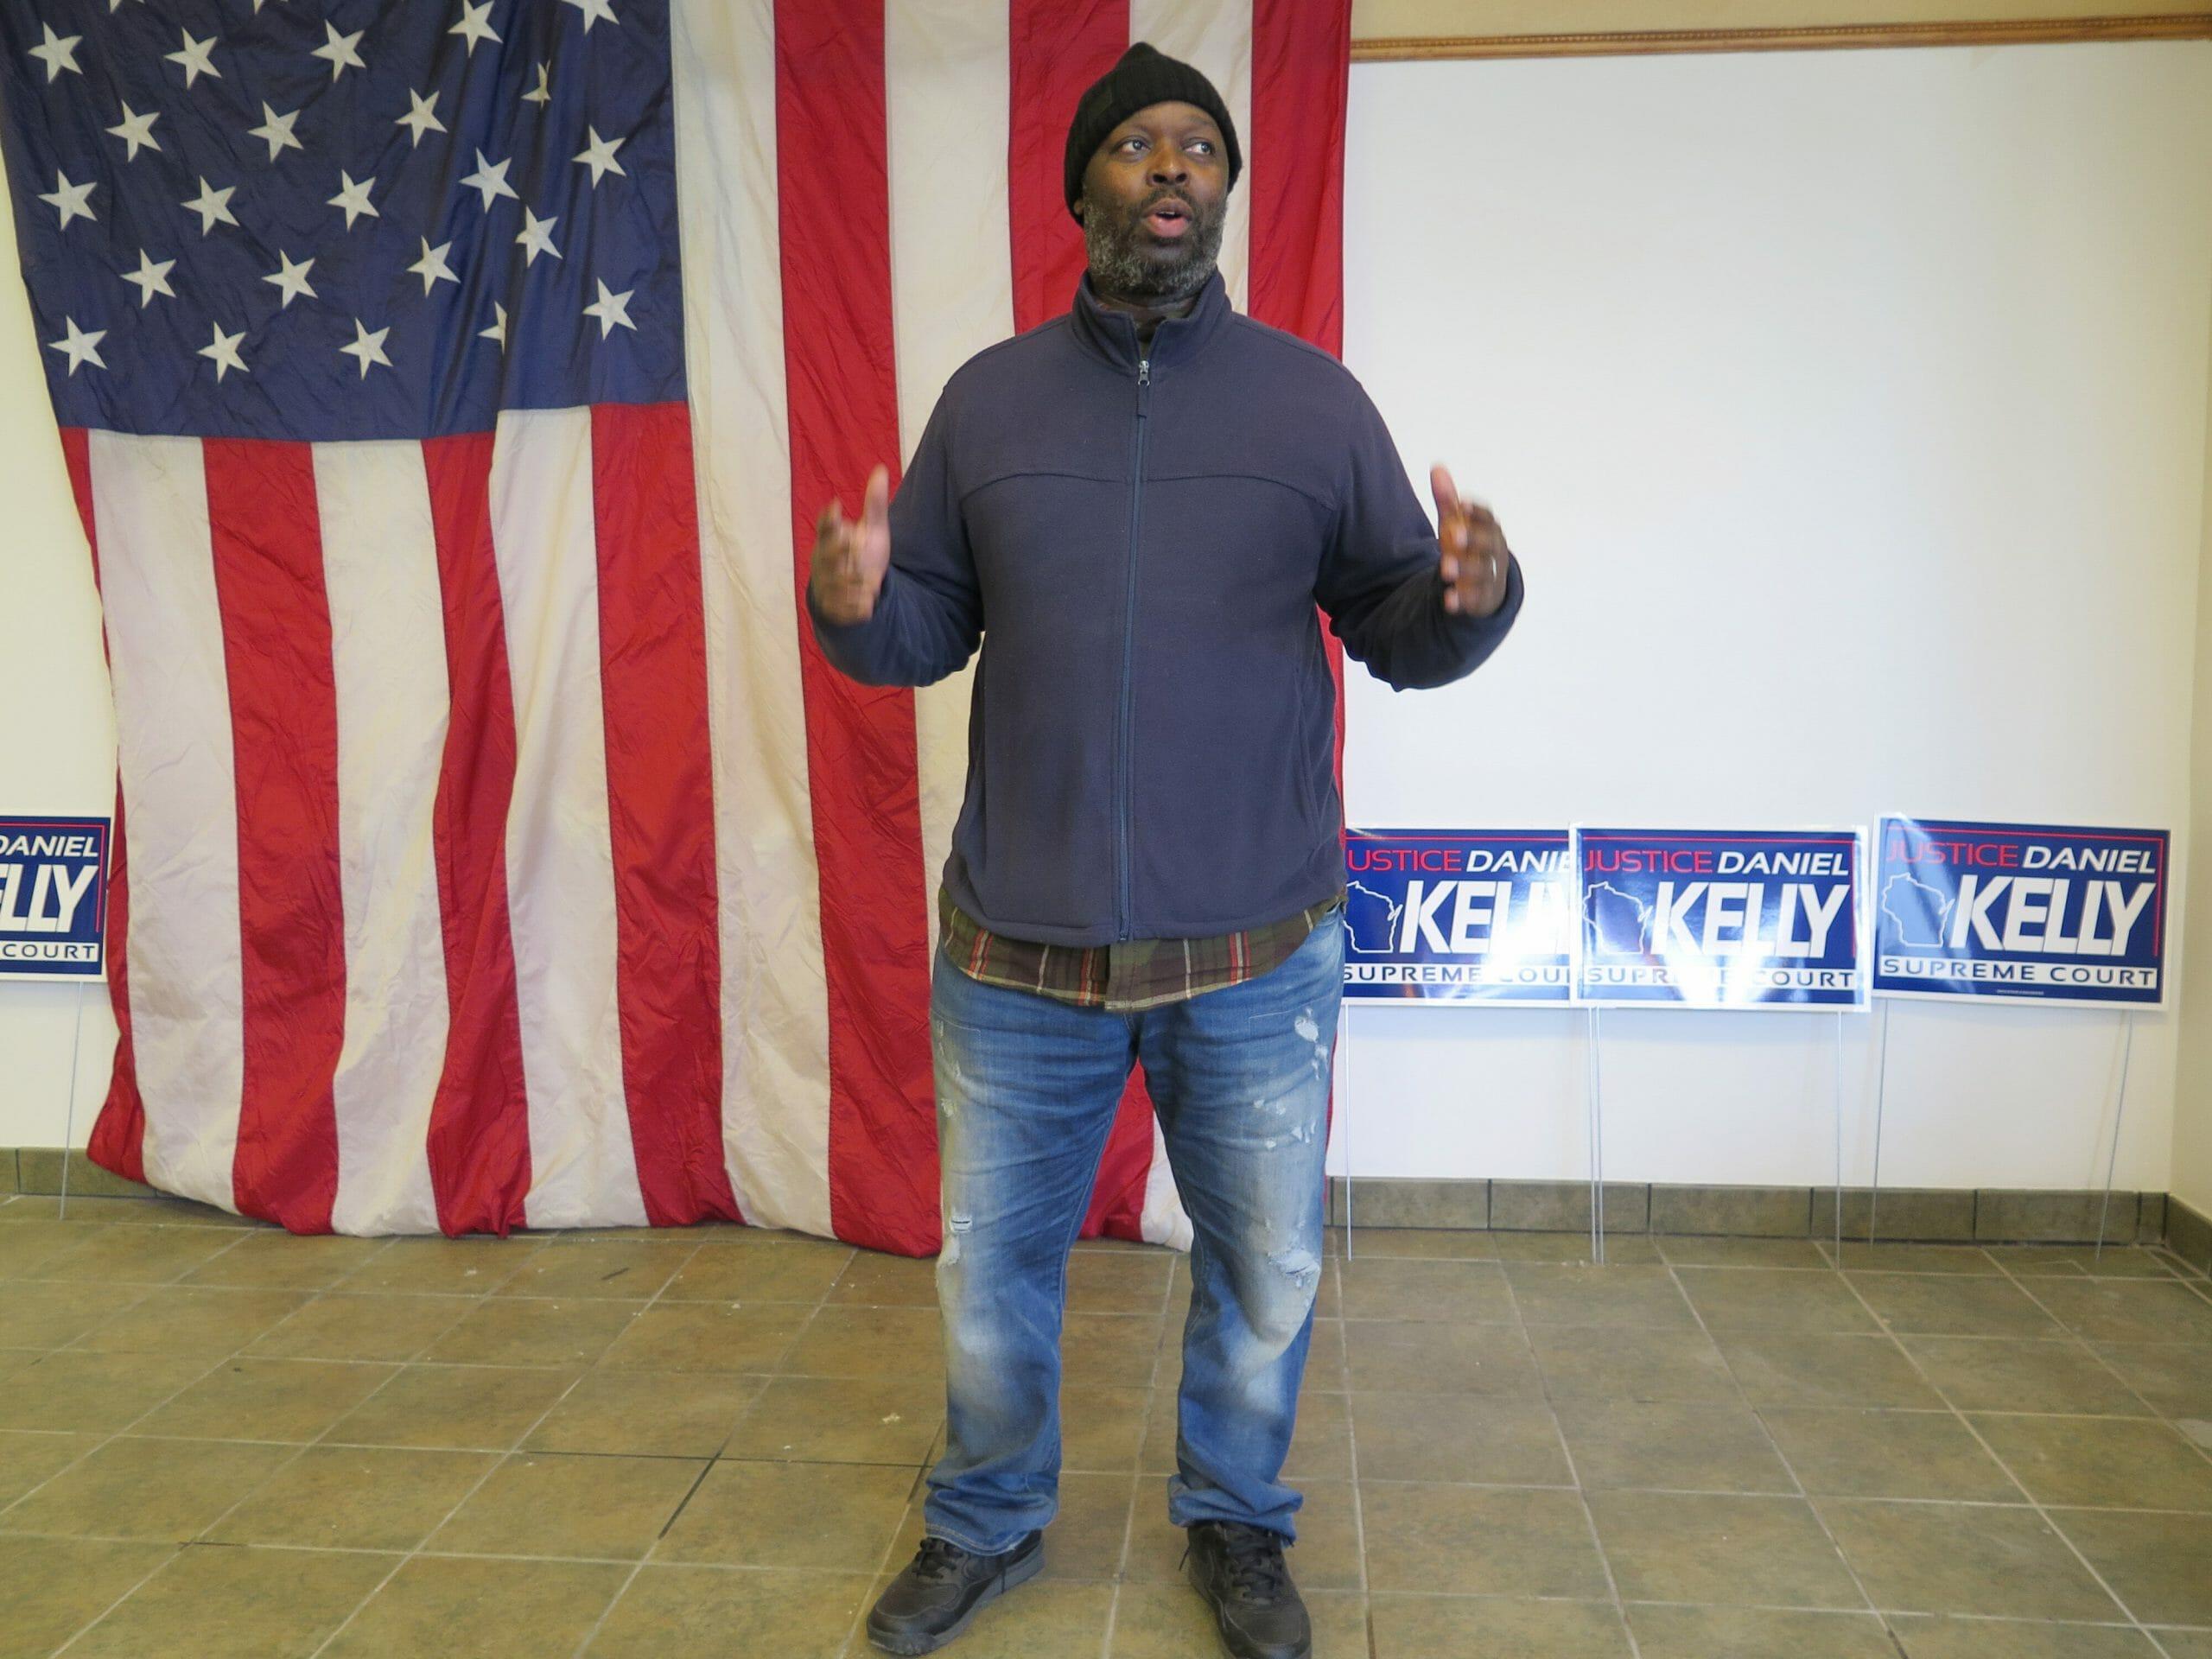 Republican candidate Orlando Owens